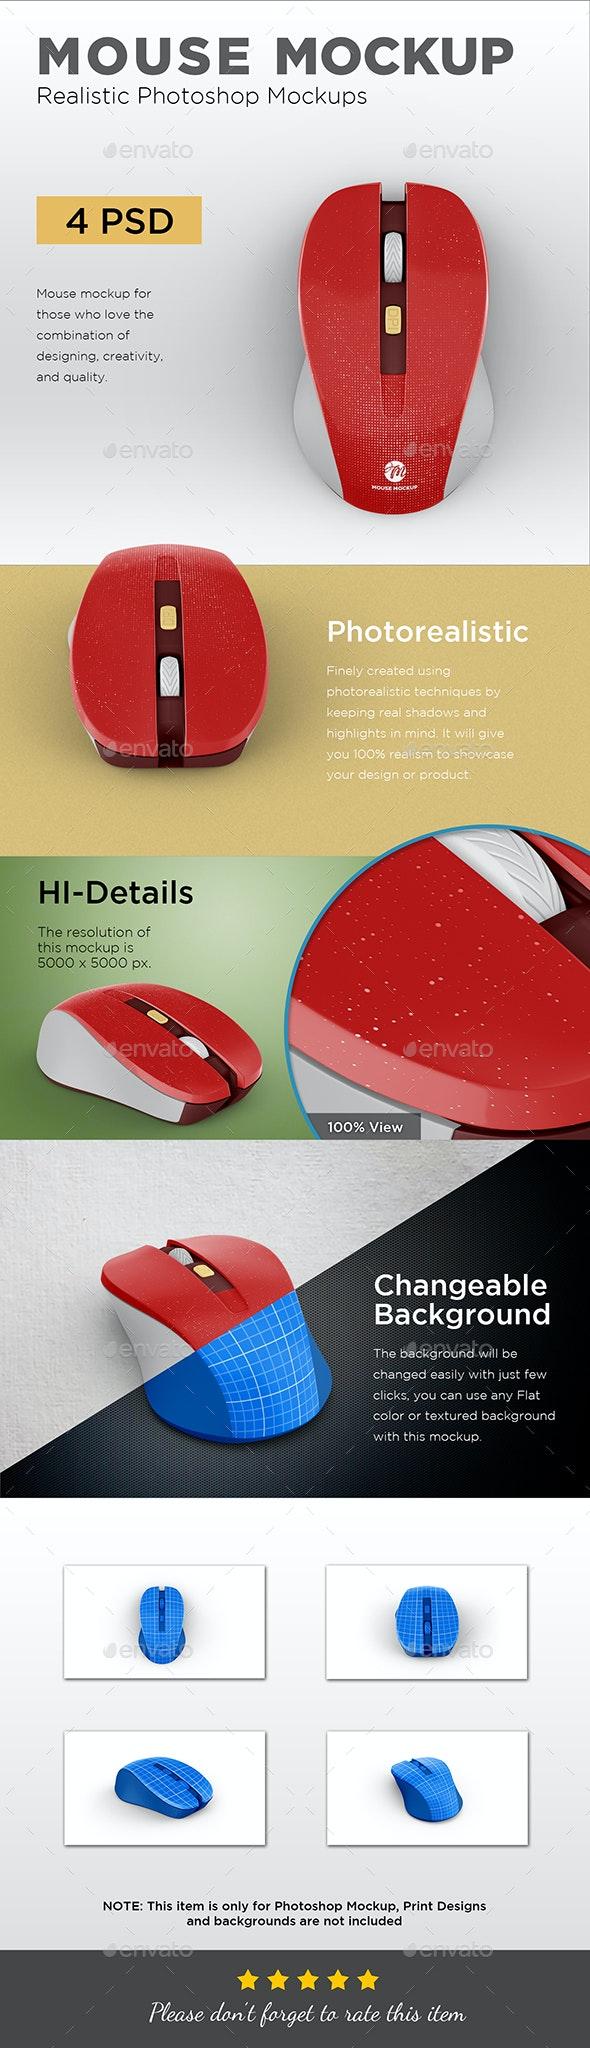 Mouse Mockup - Displays Product Mock-Ups